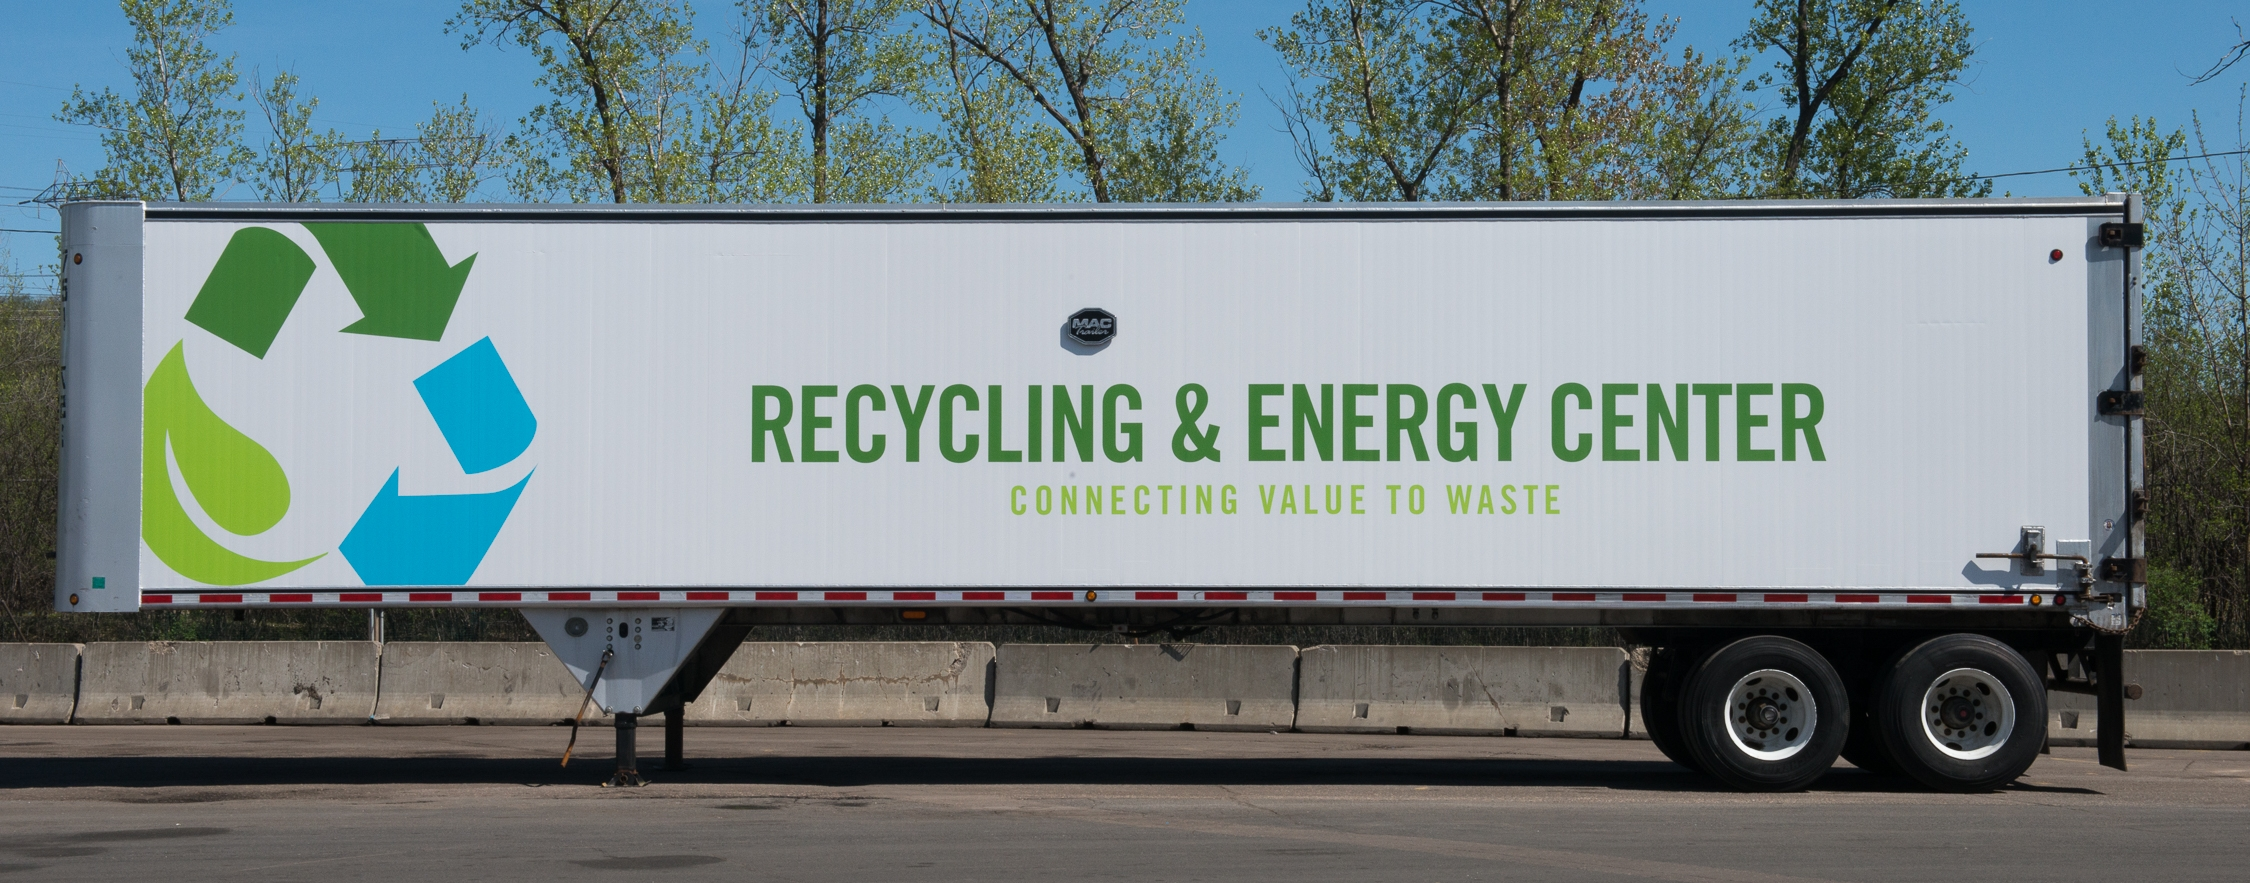 Recycling & Energy Center trailer